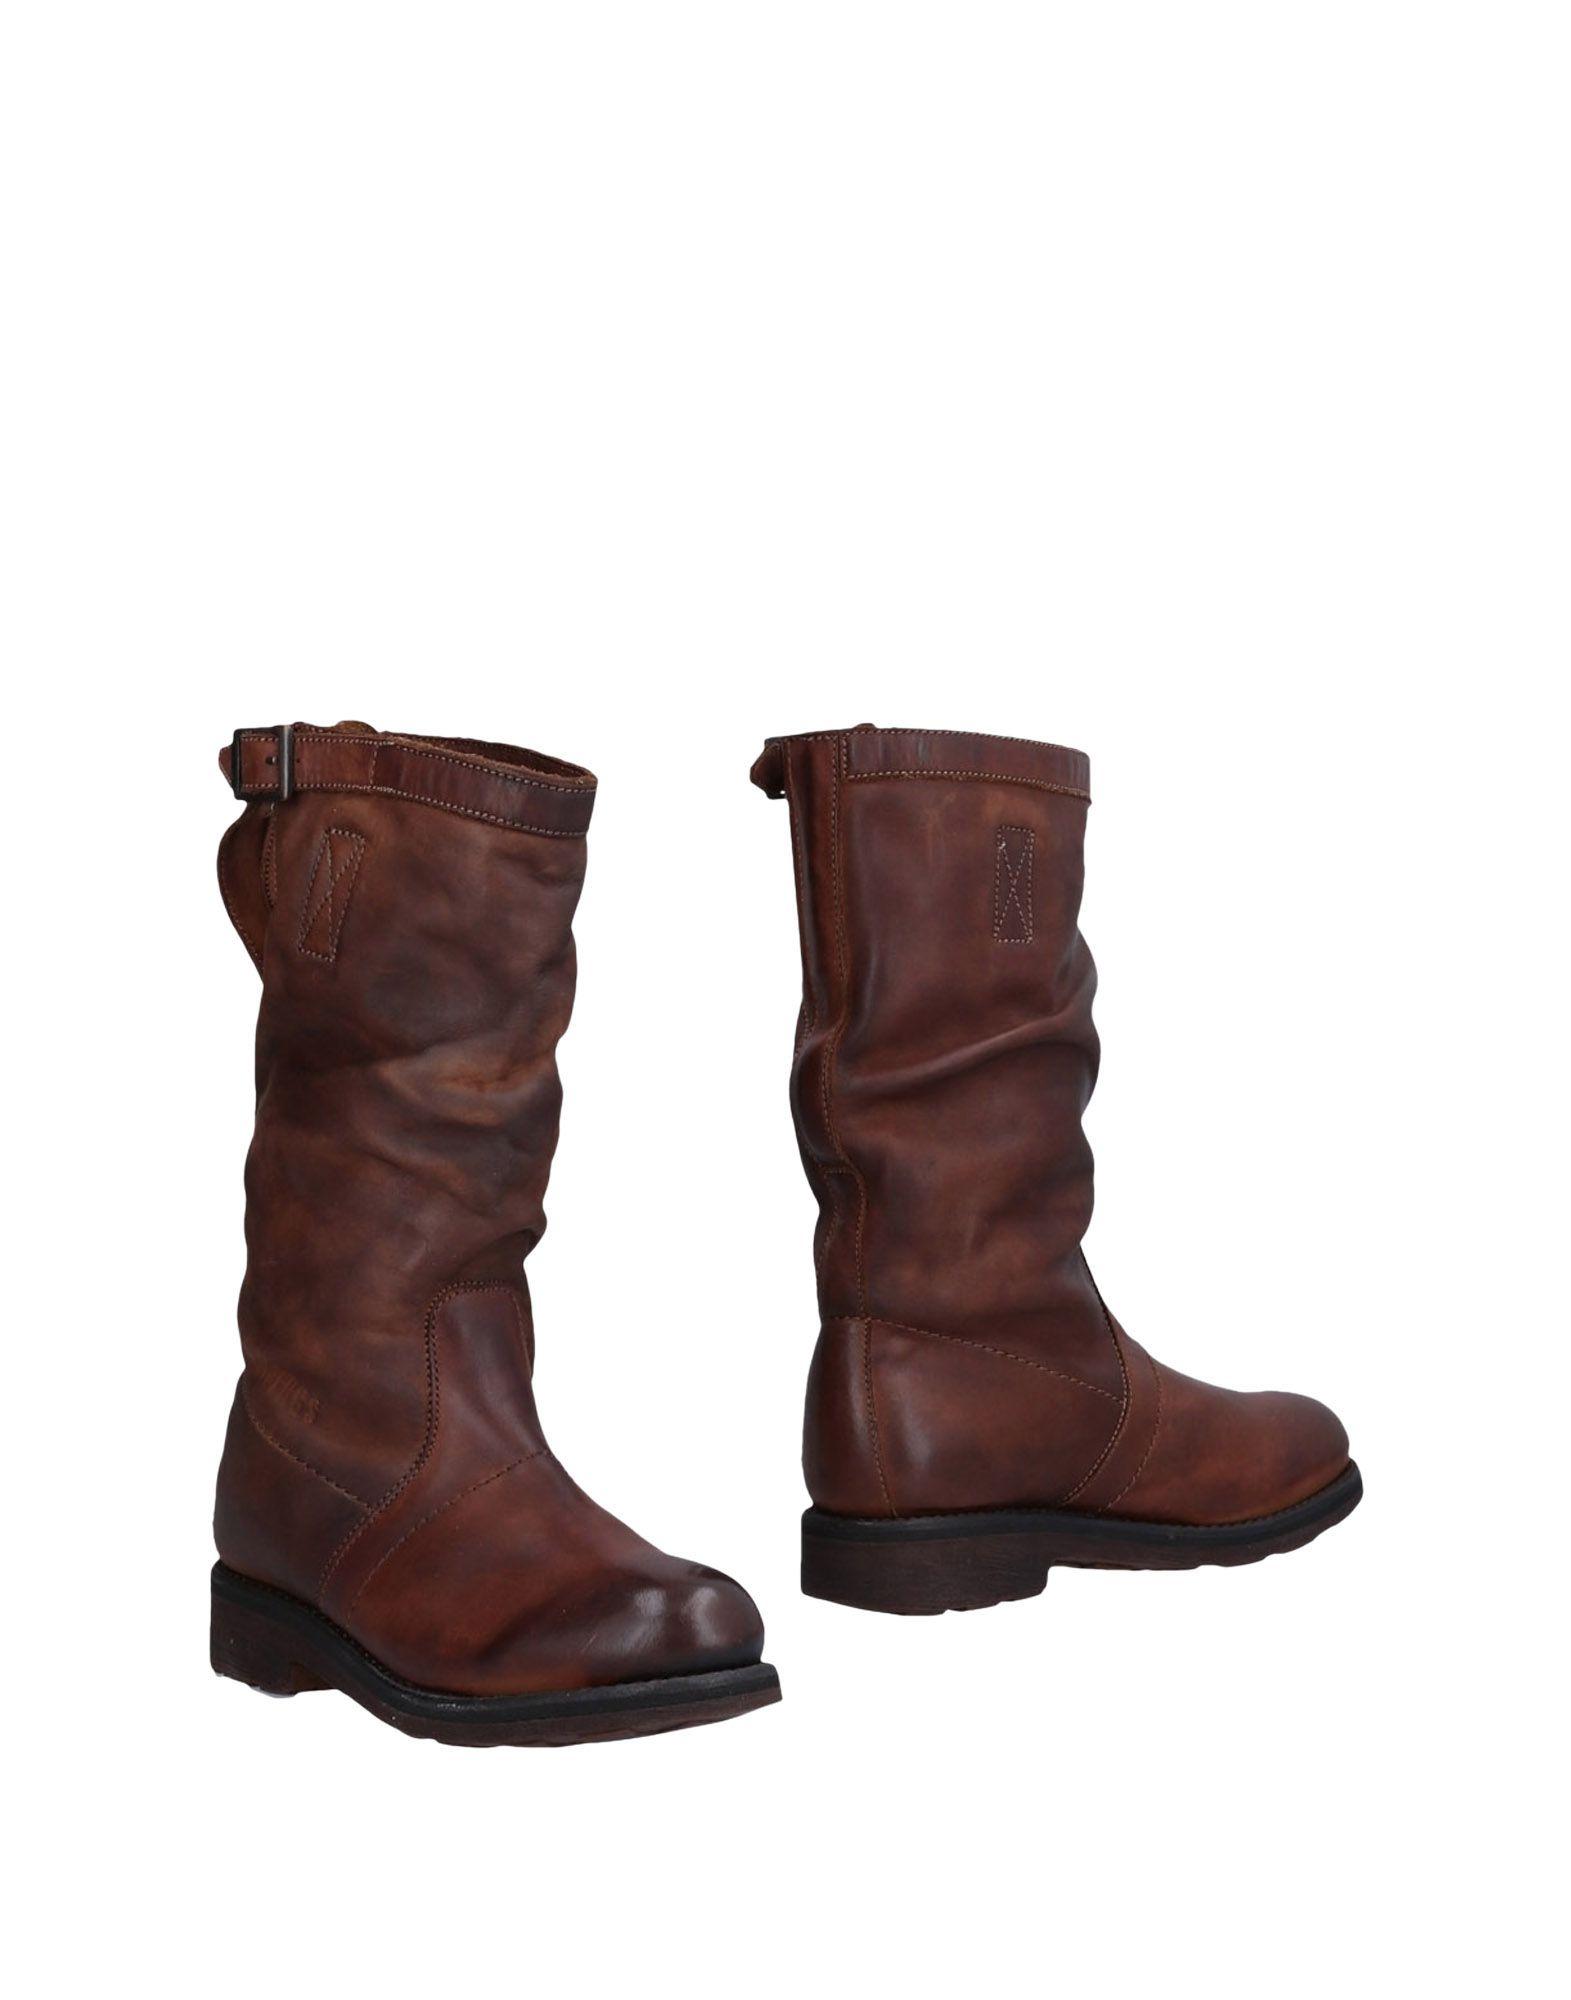 Bikkembergs Stiefel Damen  11484134KMGut Schuhe aussehende strapazierfähige Schuhe 11484134KMGut 875b4c